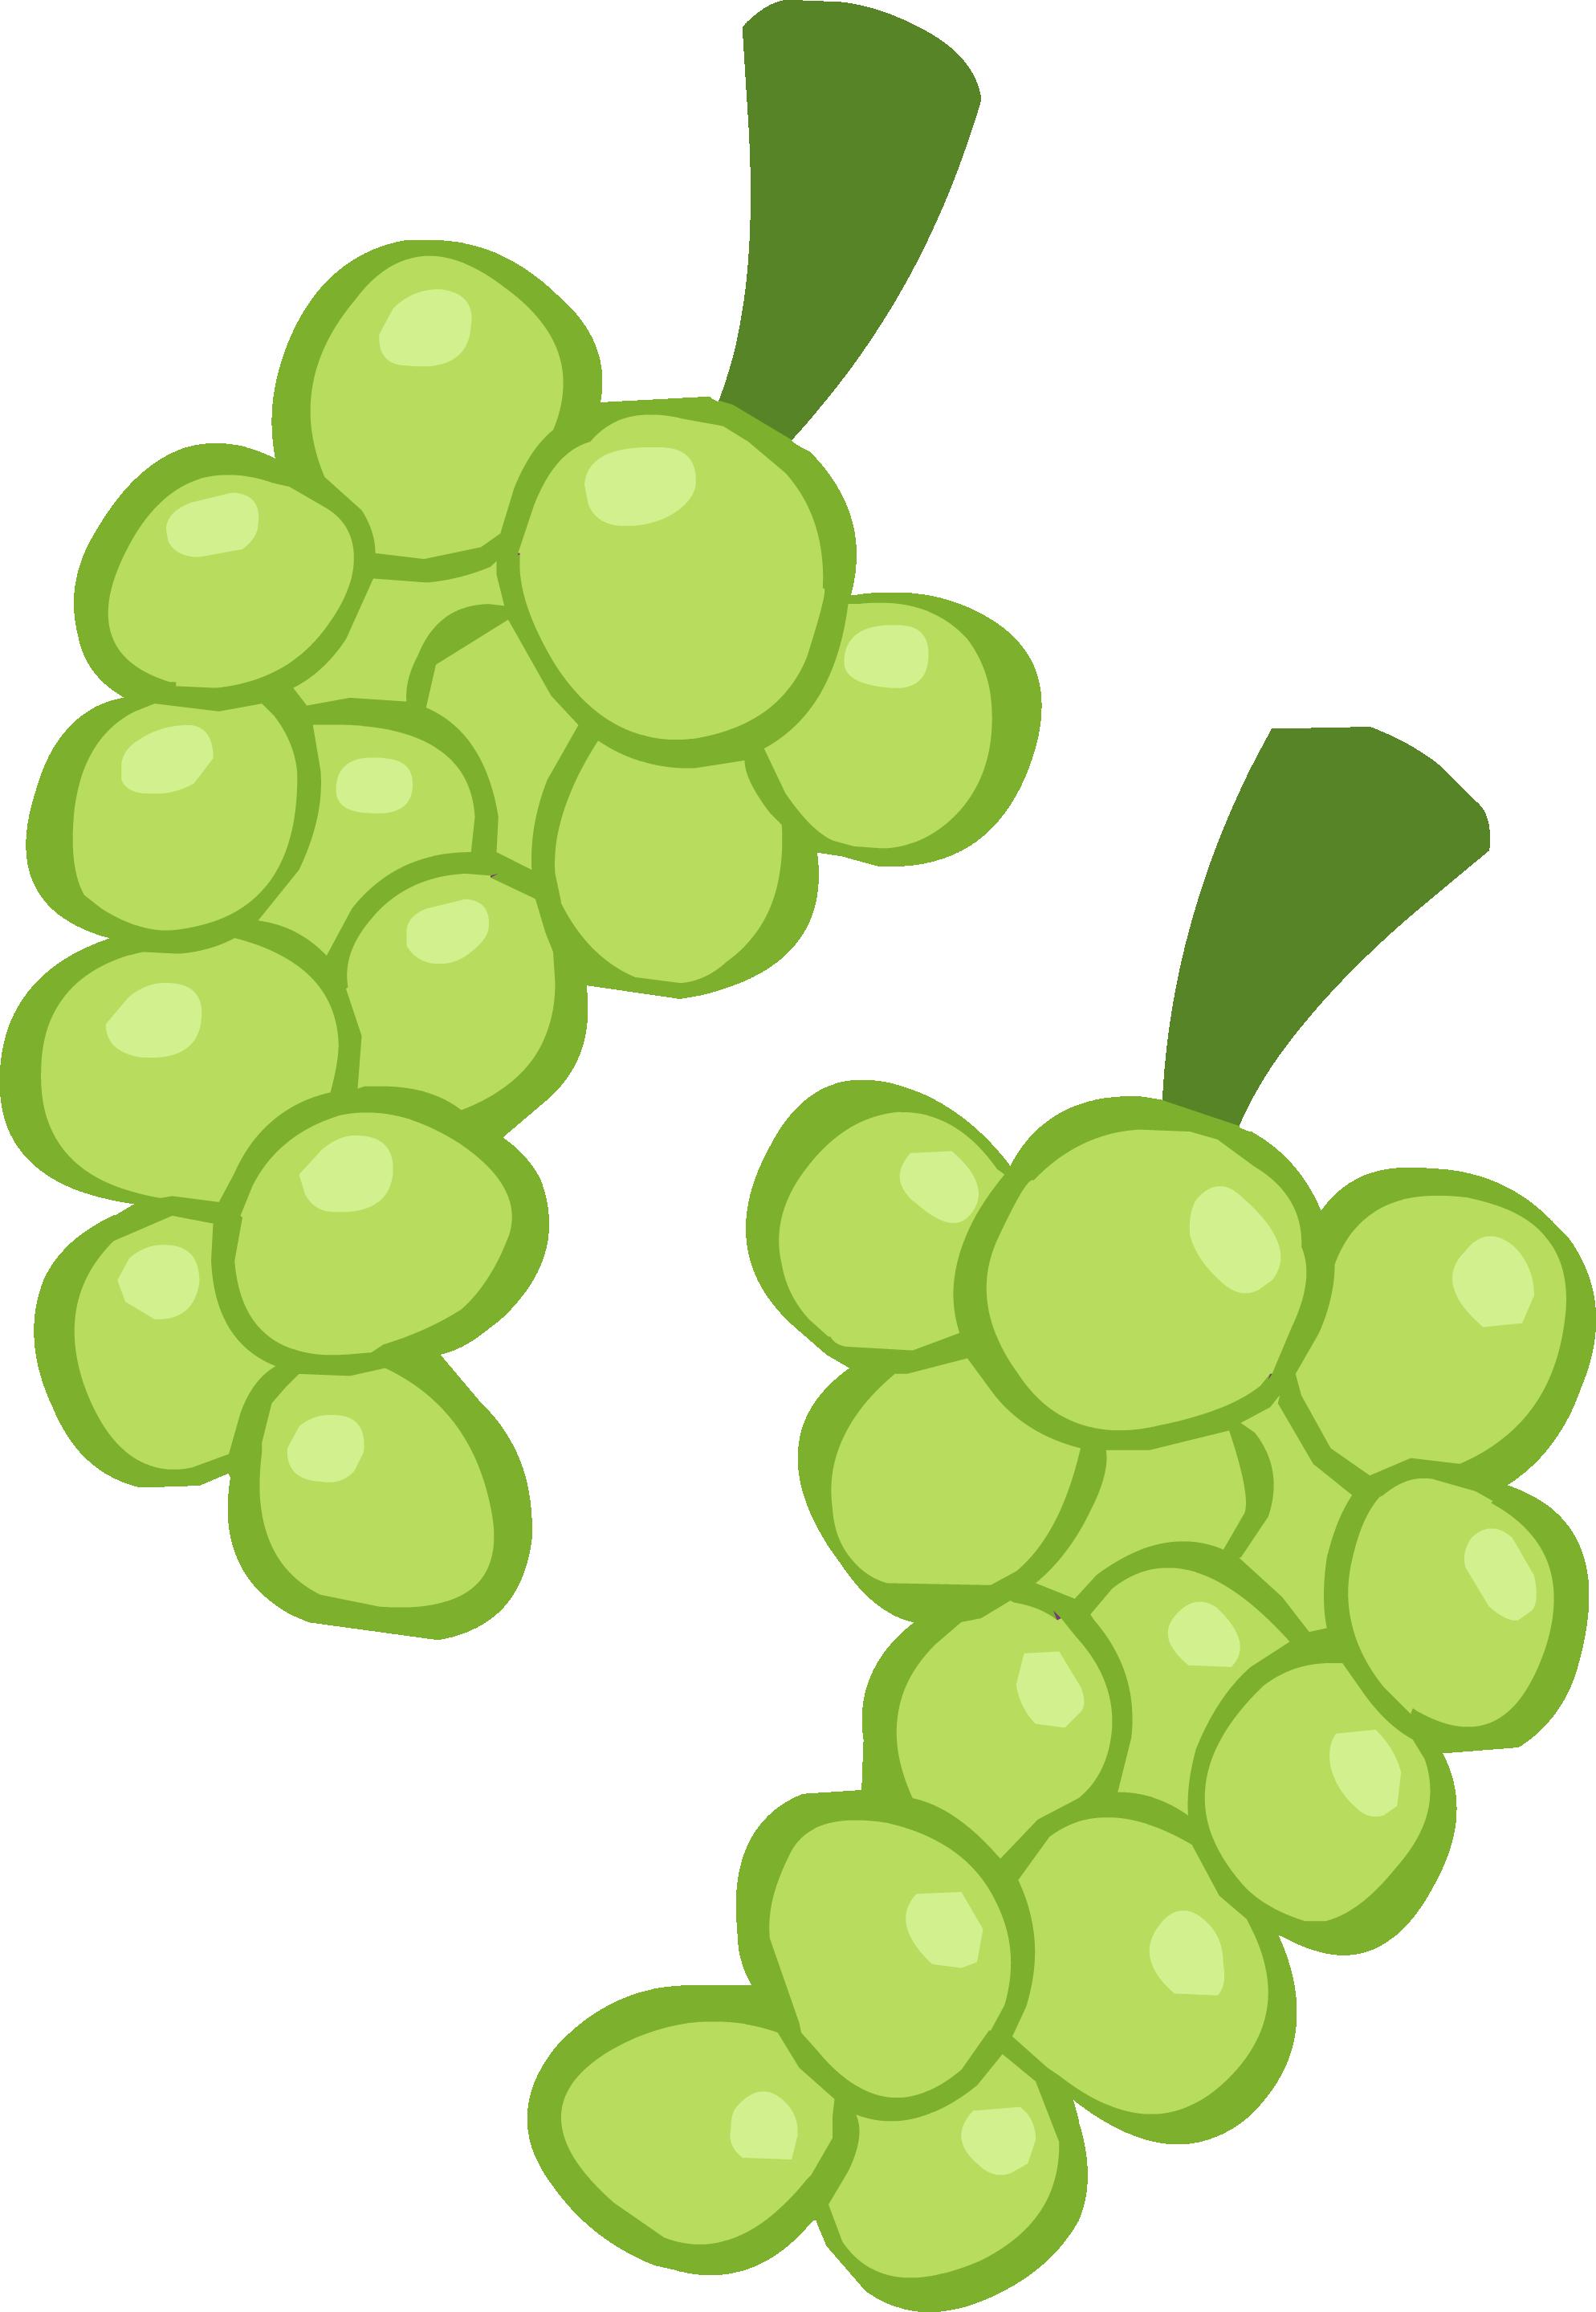 Clipart apples grape. Image ponymaker grapes png